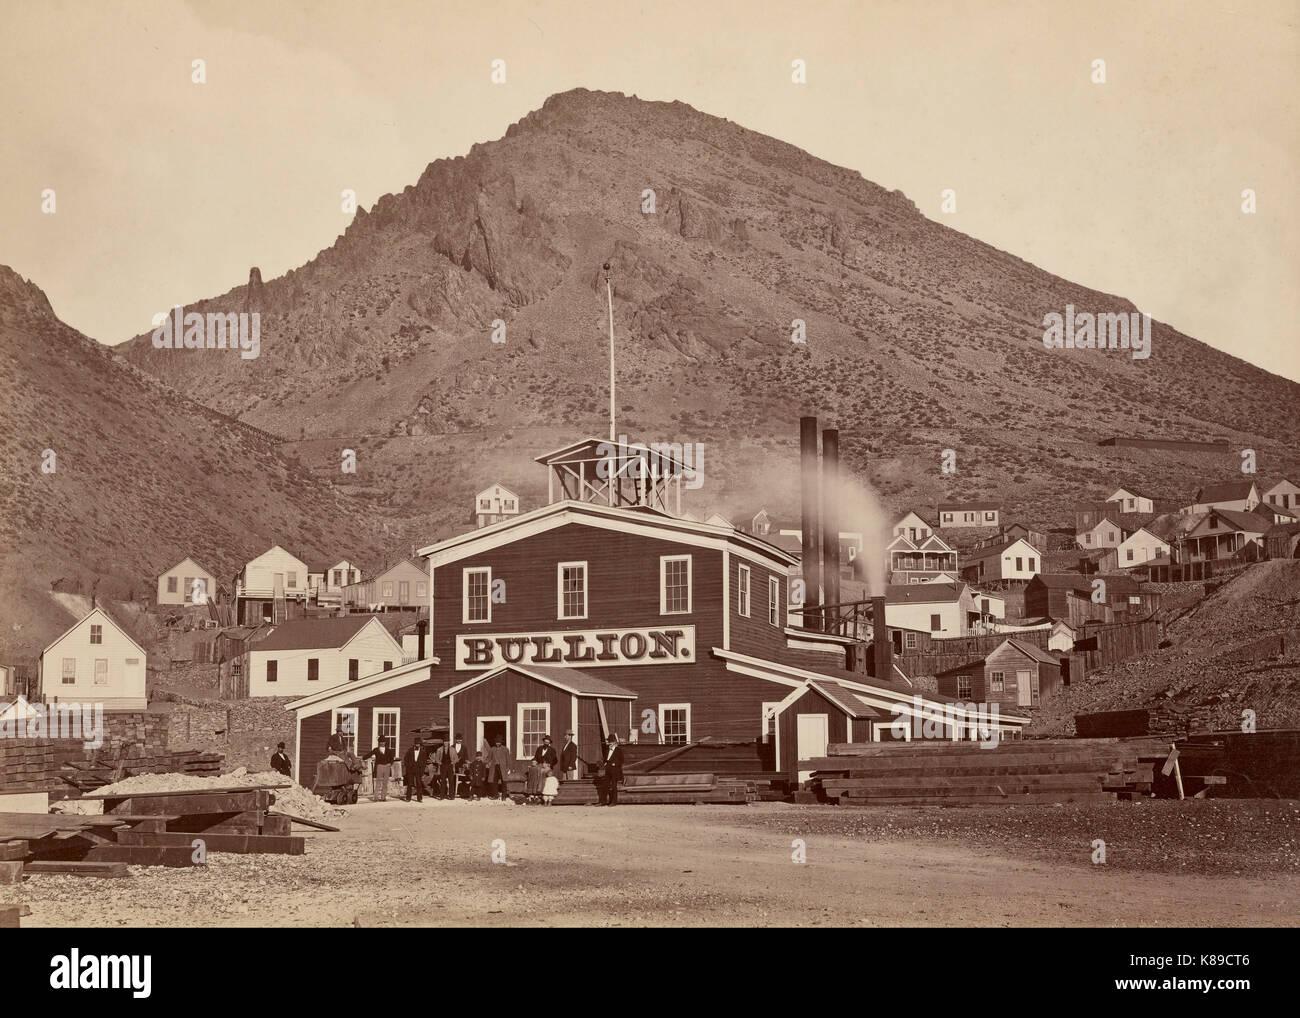 The Bullion Mine, Virginia City, Nevada - Carleton Watkins - circa 1876 - Stock Image